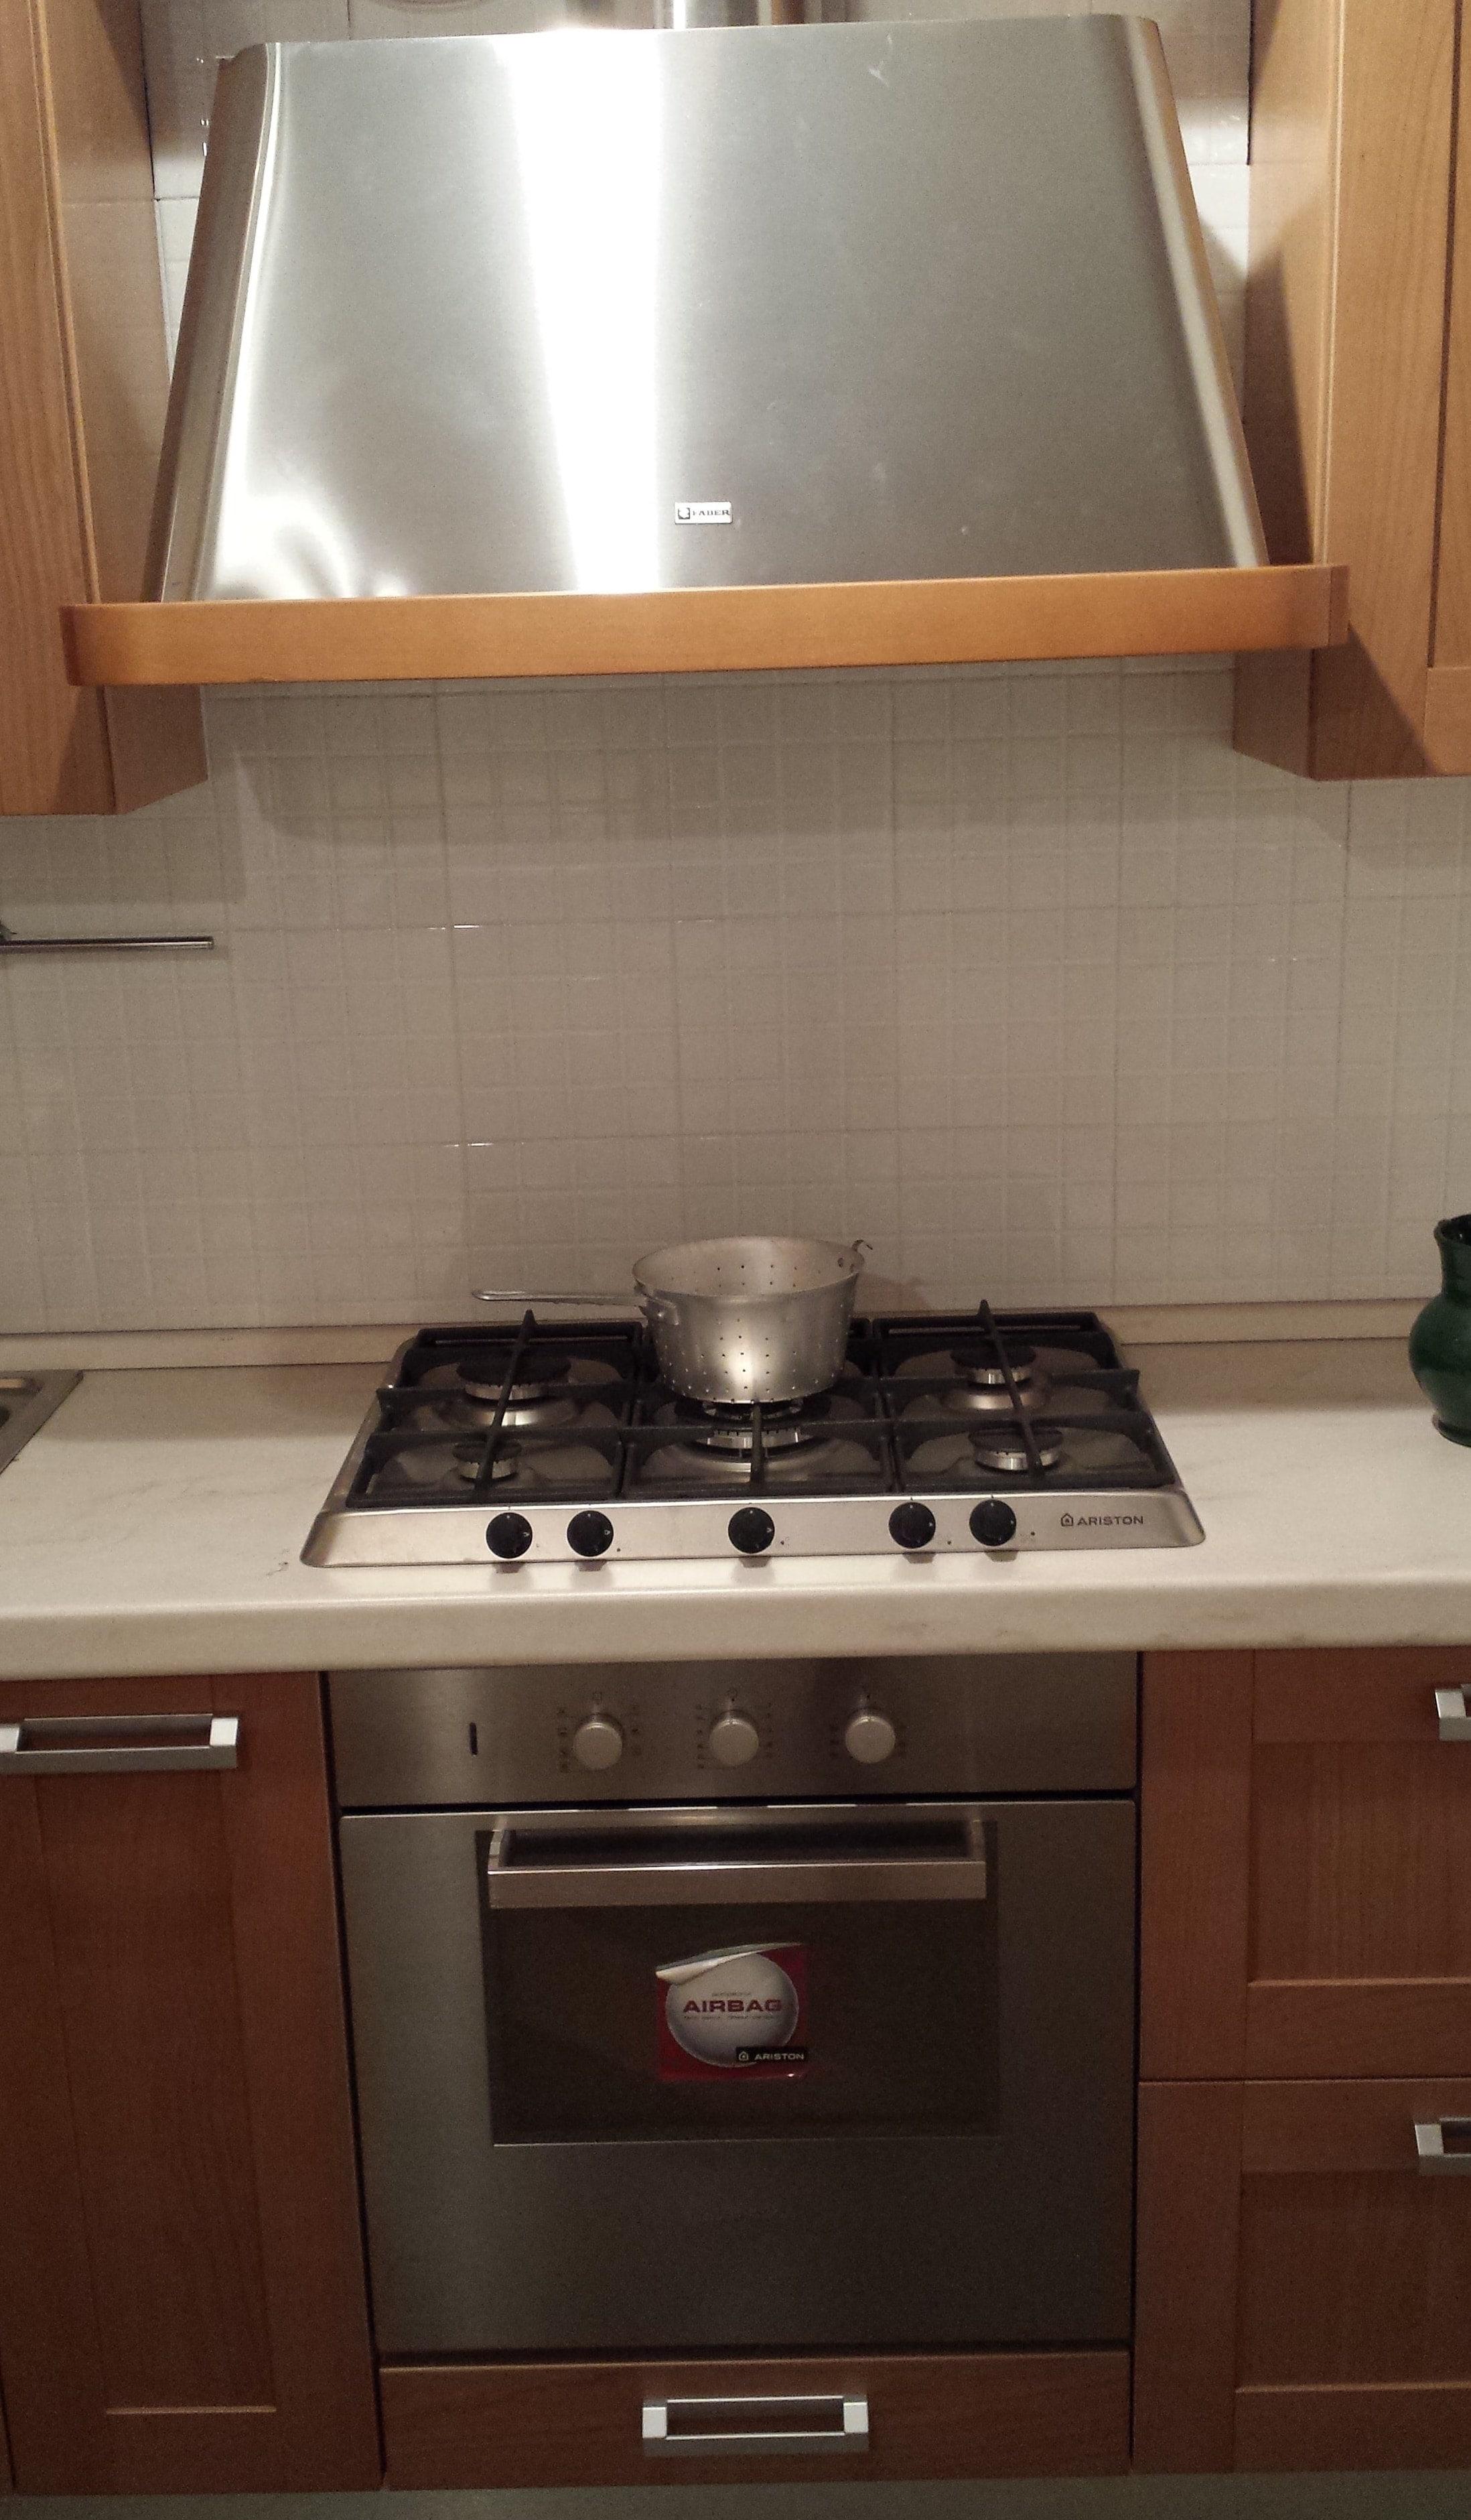 cucina lube gaia - 28 images - cucina gaia prezzo cucine lube 187 ...